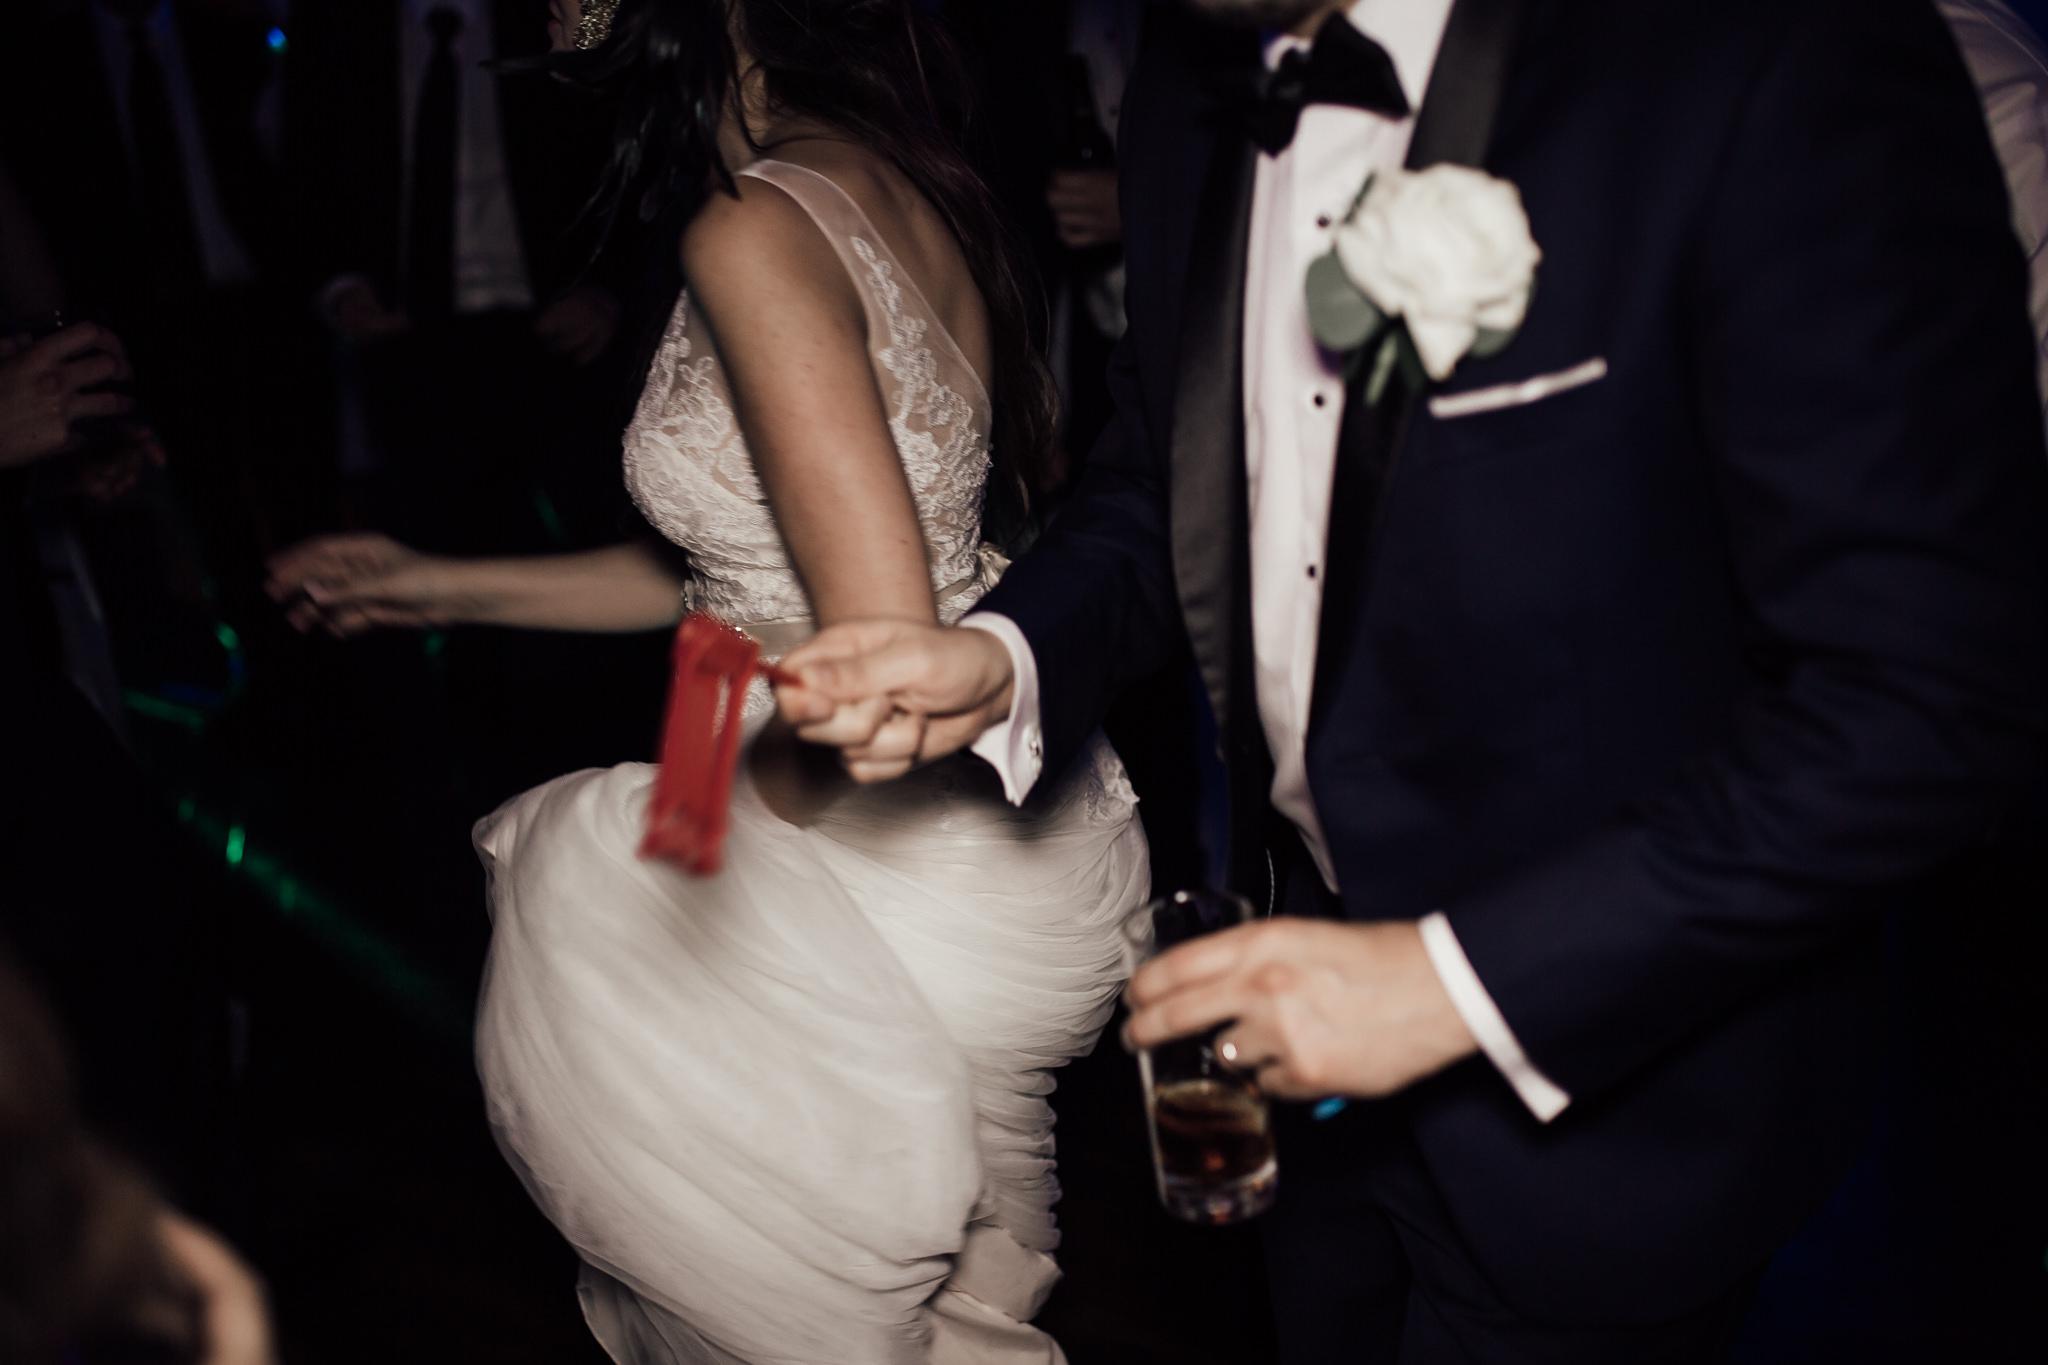 cassie-cook-photography-memphis-wedding-photographer-the-atrium-at-overton-square-41.jpg